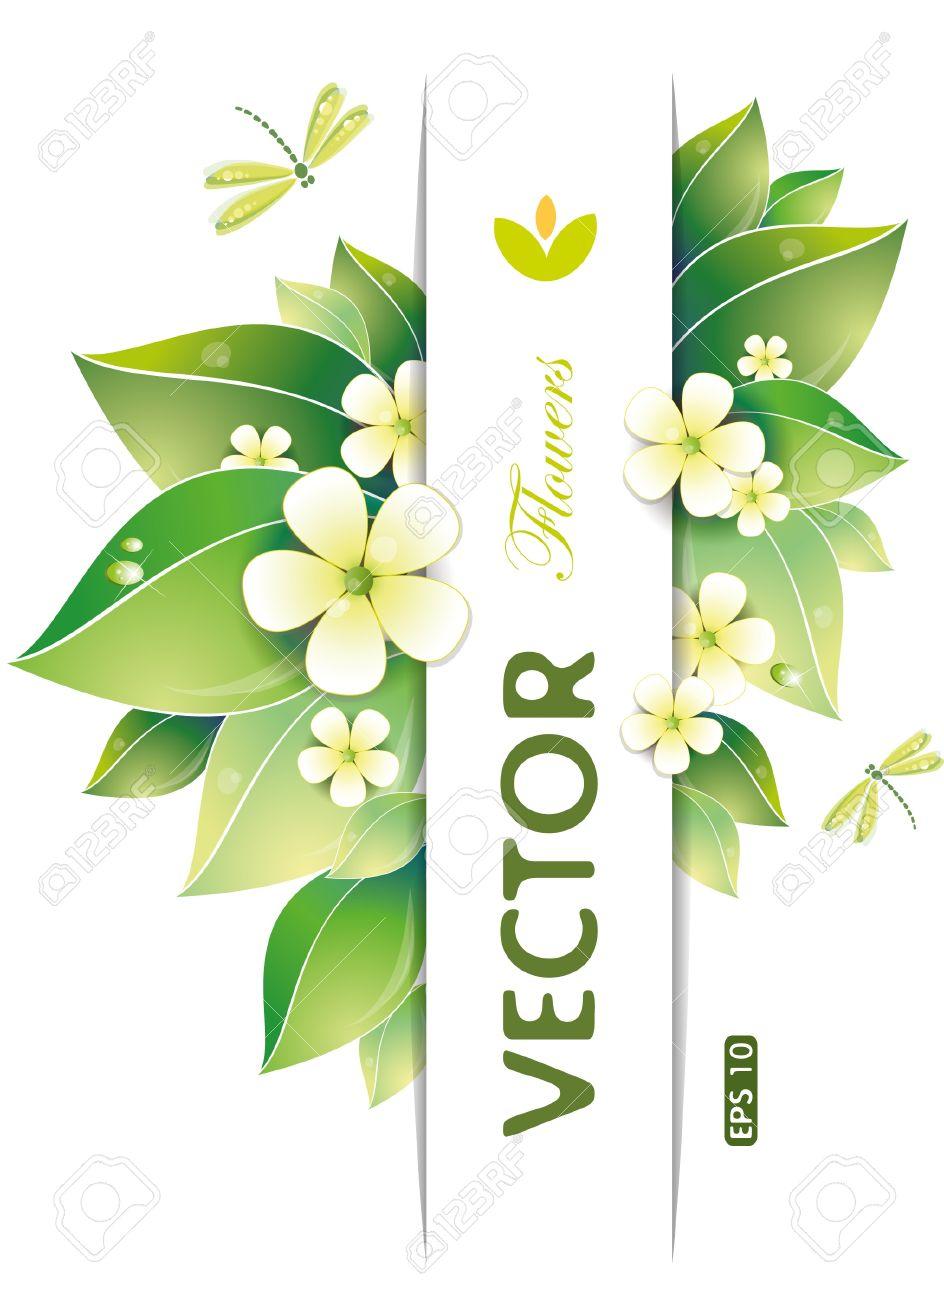 Green leaves and jasmin flowers, vector illustration, eps-10 Stock Vector - 10551891